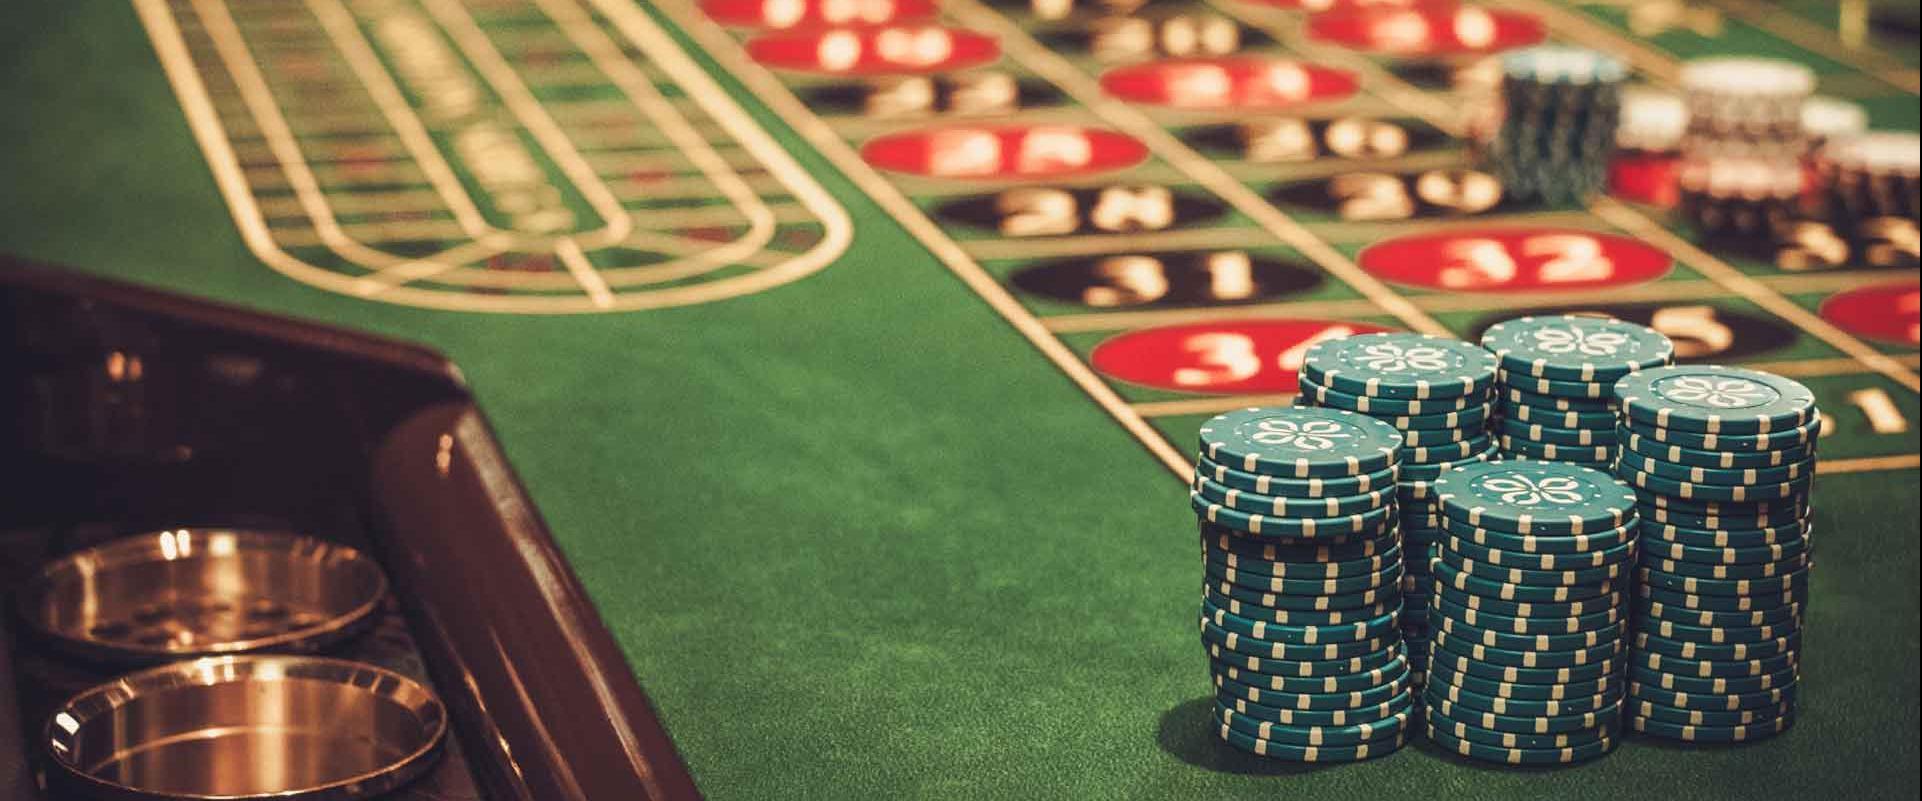 Olympic casino poker tournaments